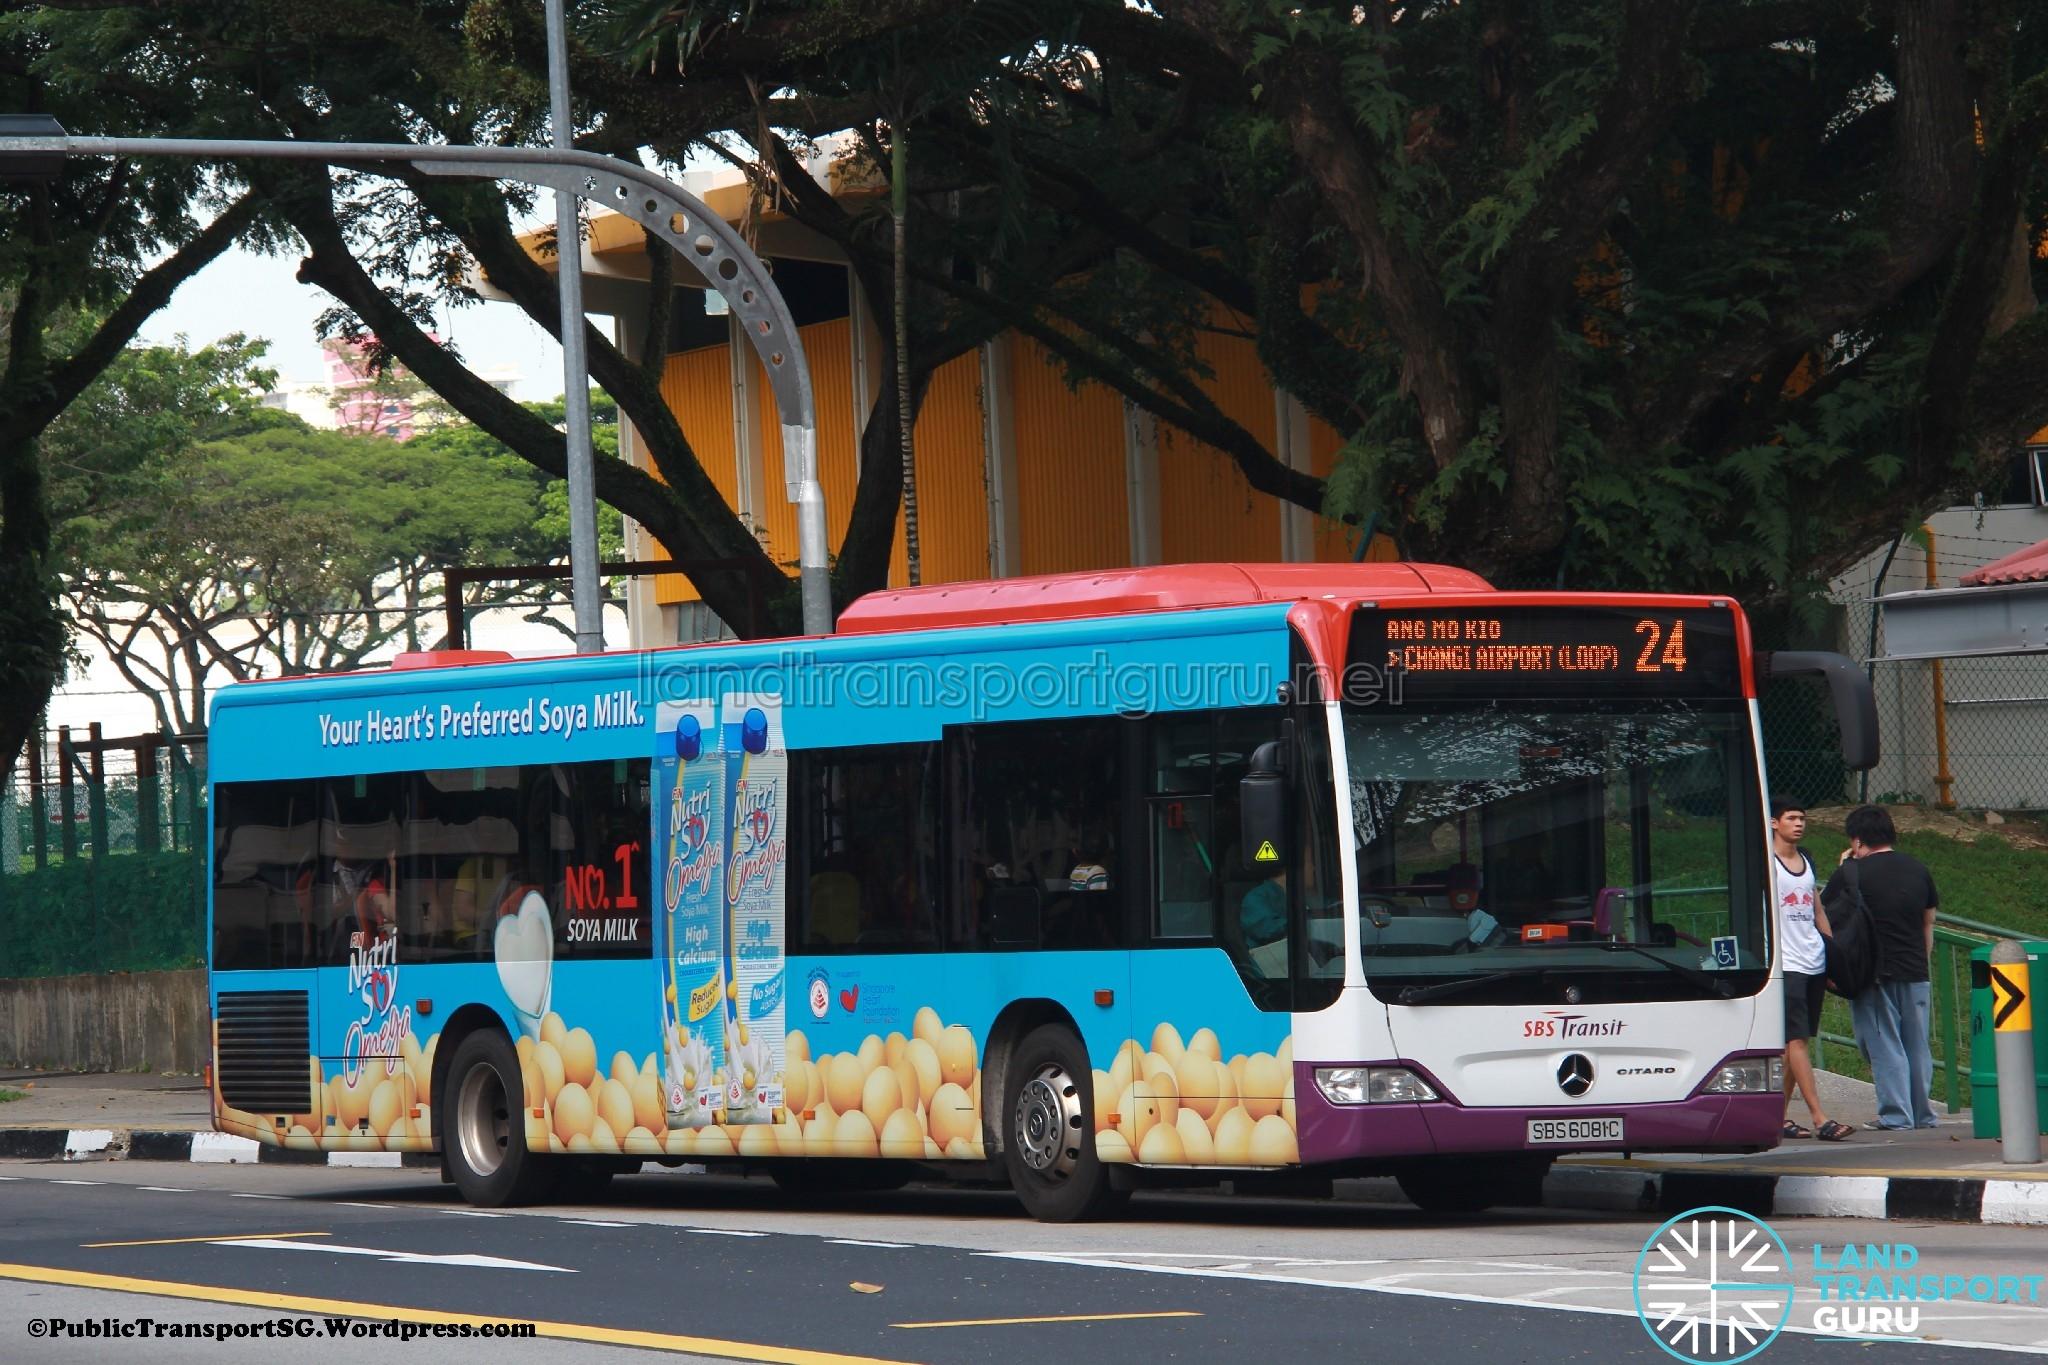 Sbs transit bus service 24 land transport guru for Mercedes benz sugar land service